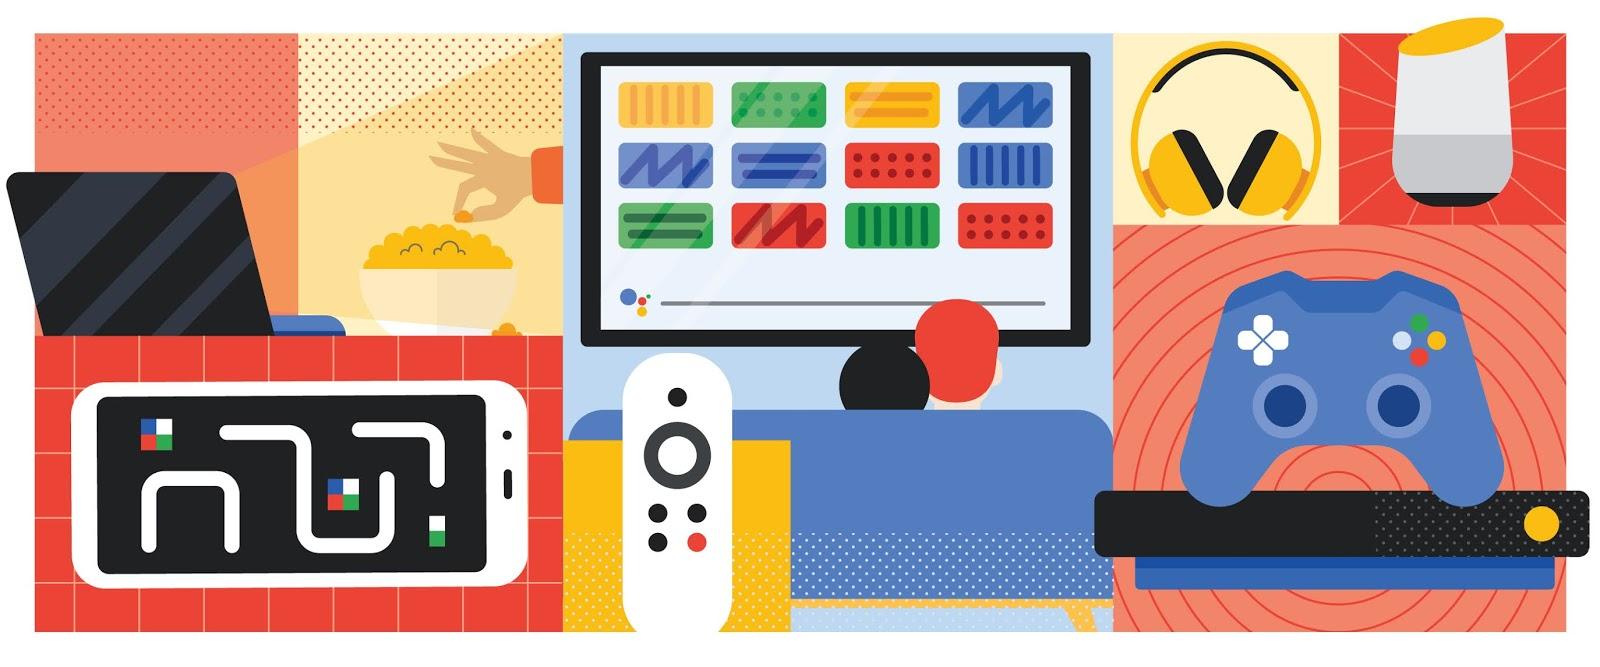 Google: Smart Home wird ab September mächtiger